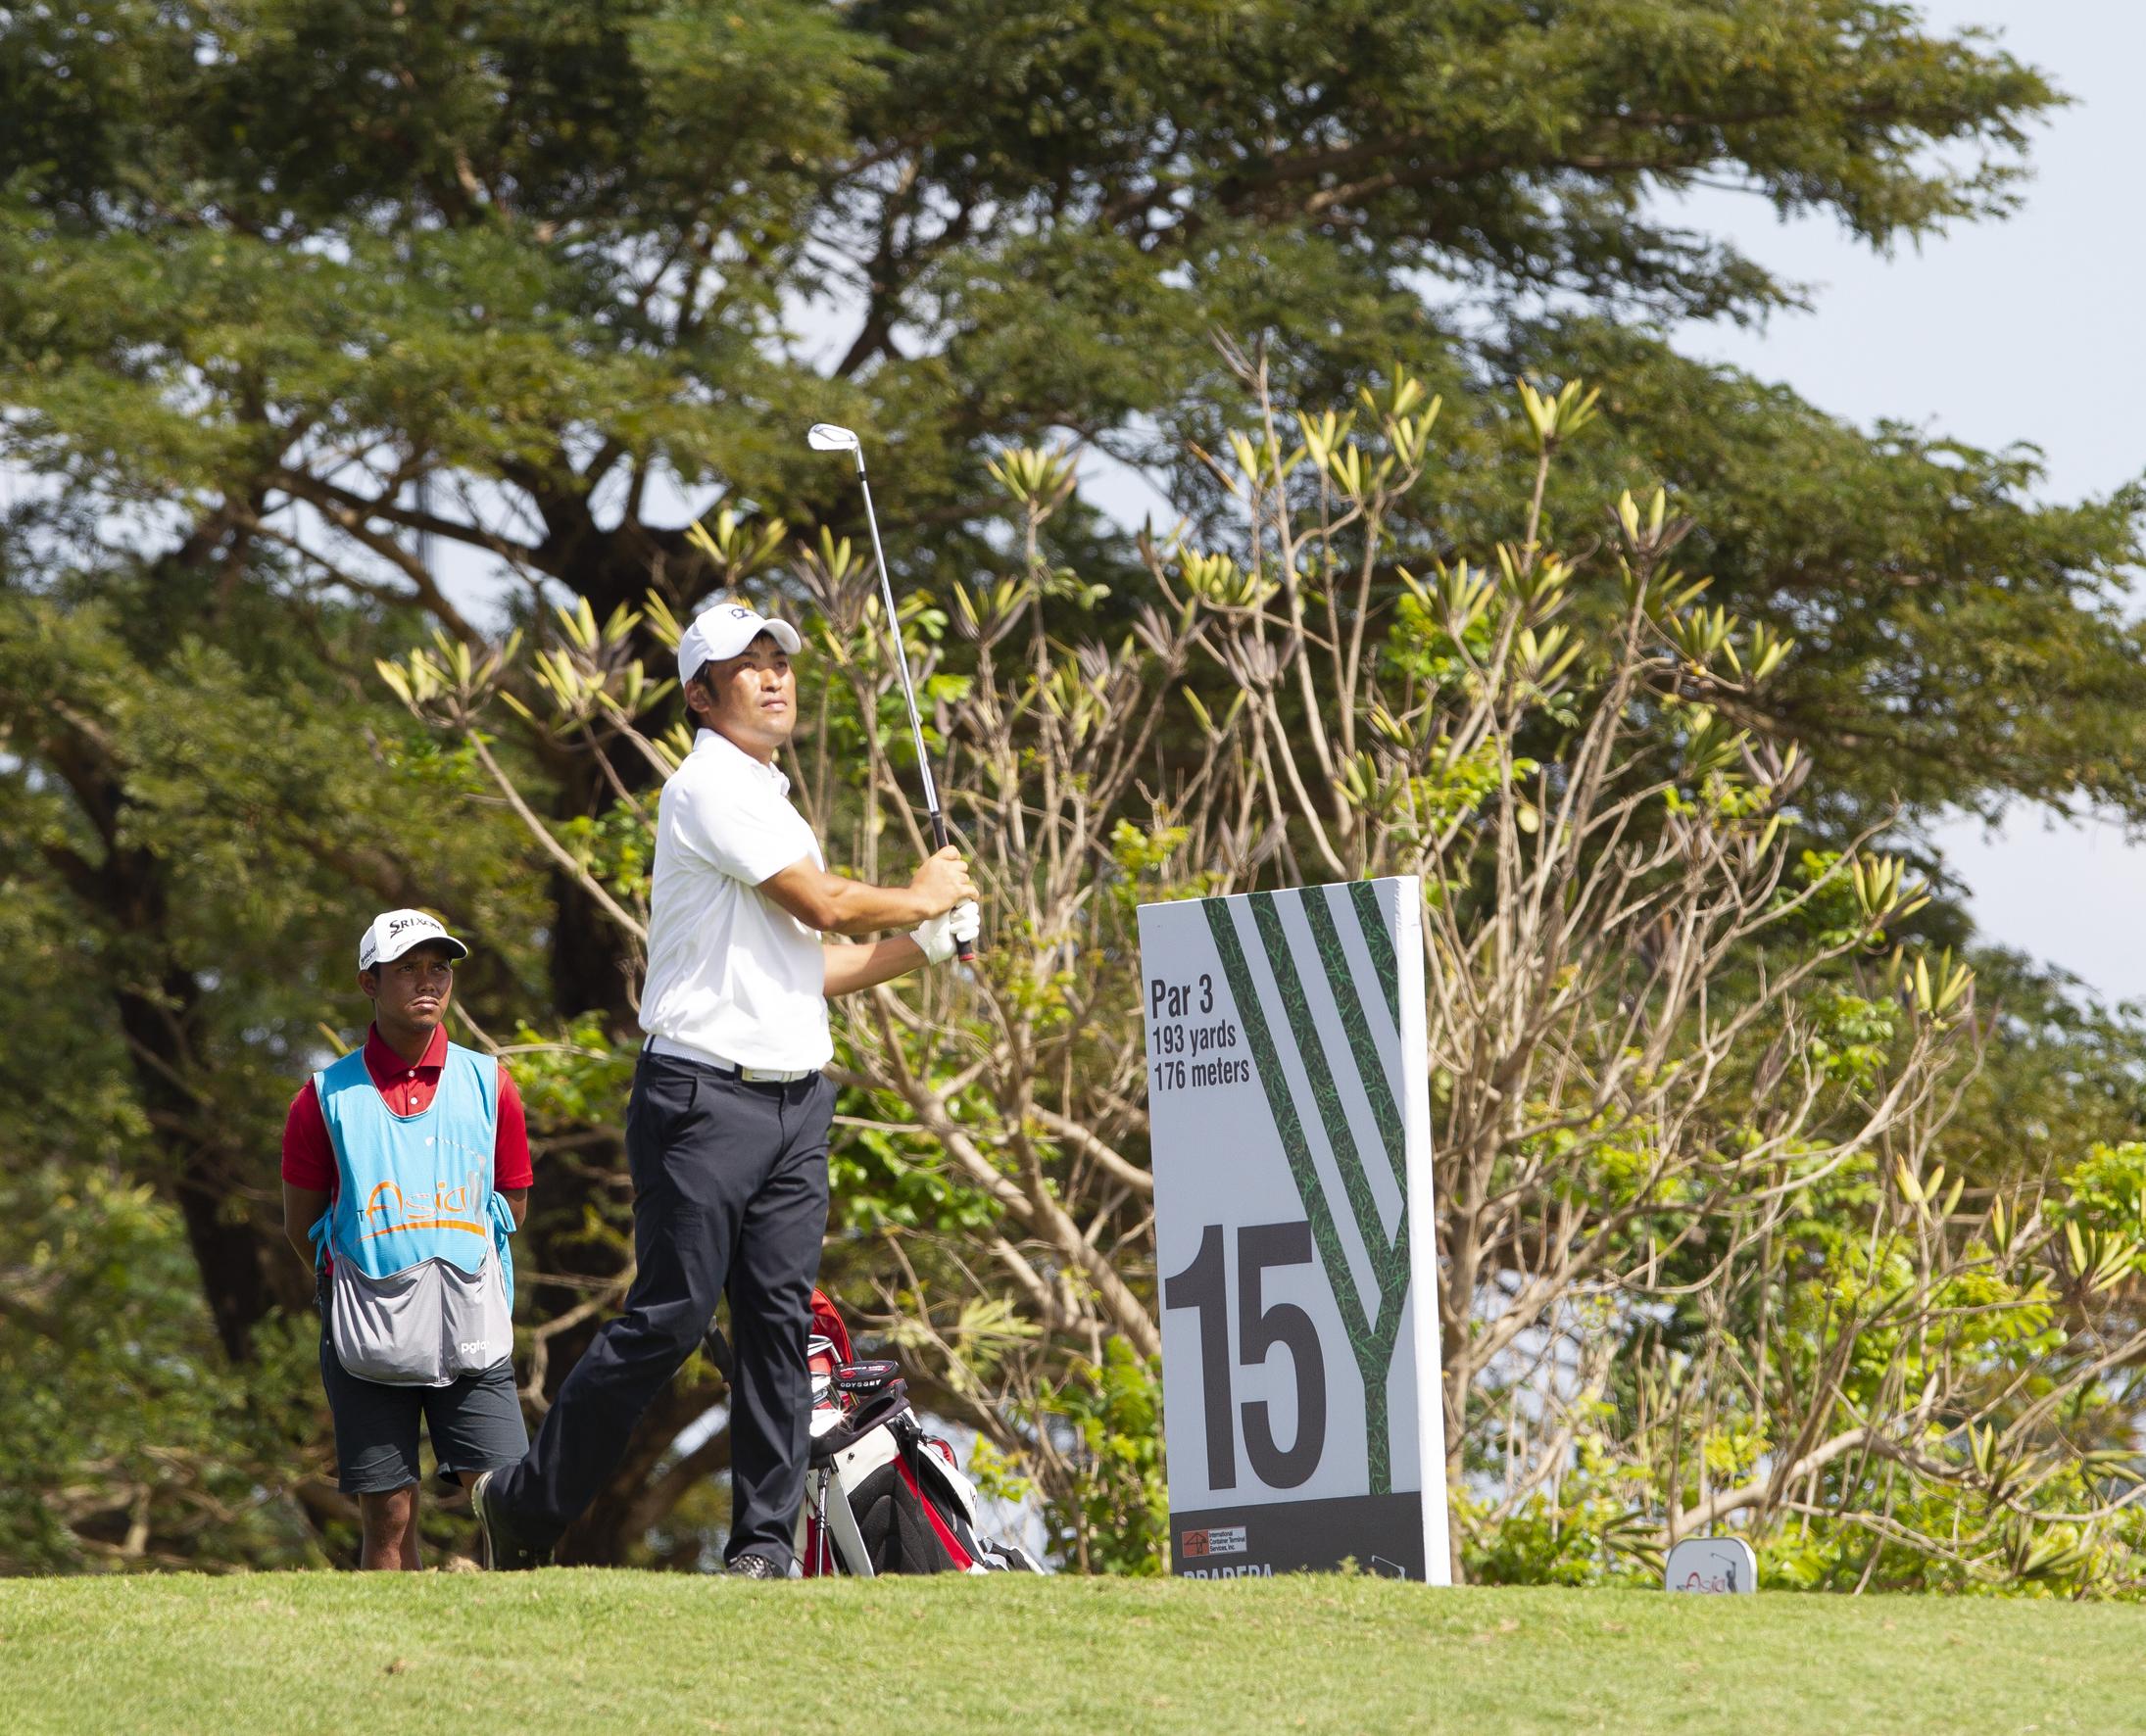 ICTSI Pradera Verde Classic: Wild finish looms as new leaders emerge